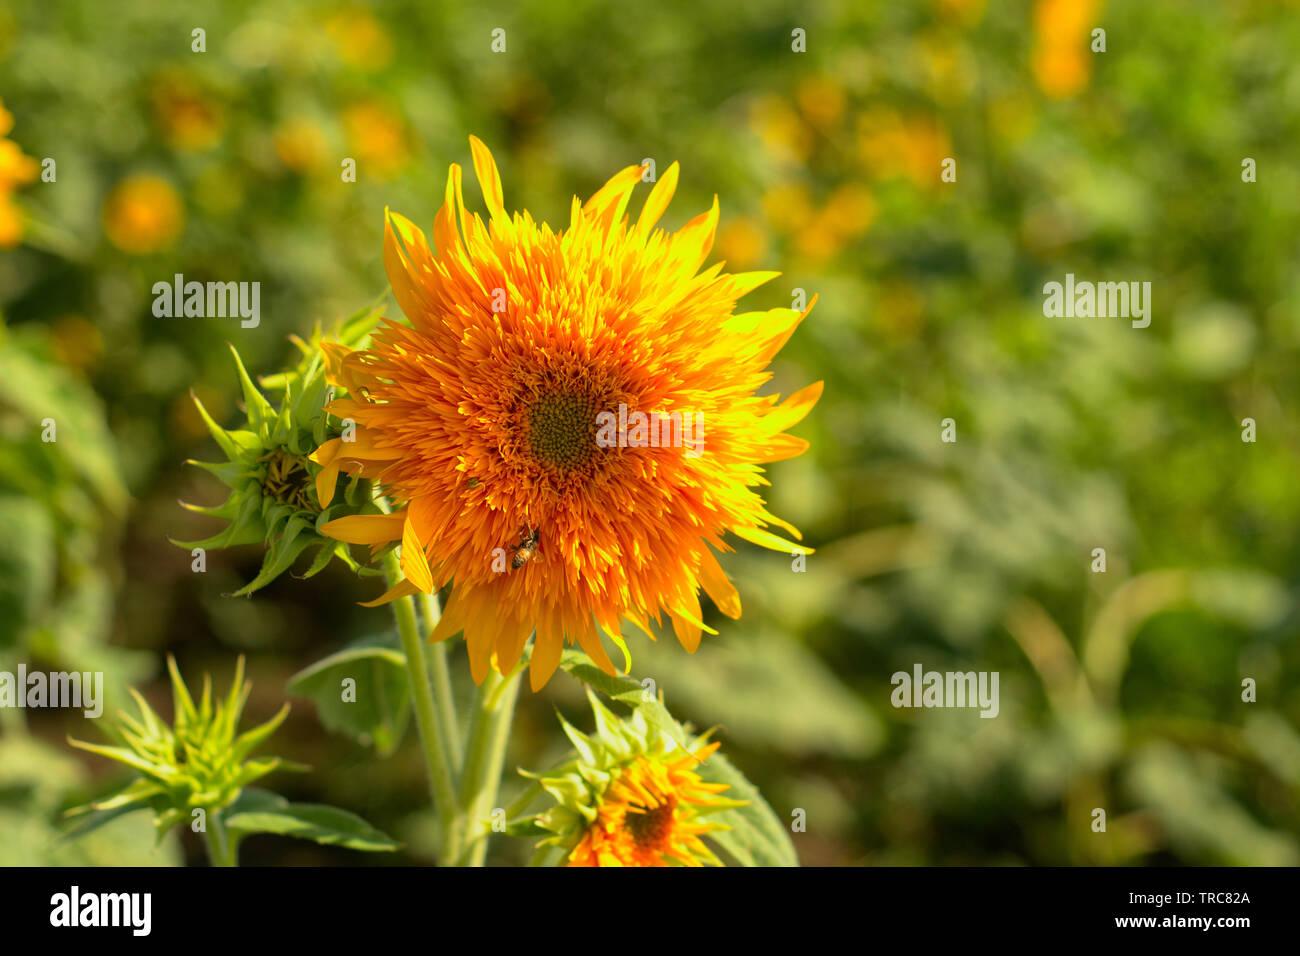 Hippie Sunflower? - Stock Image